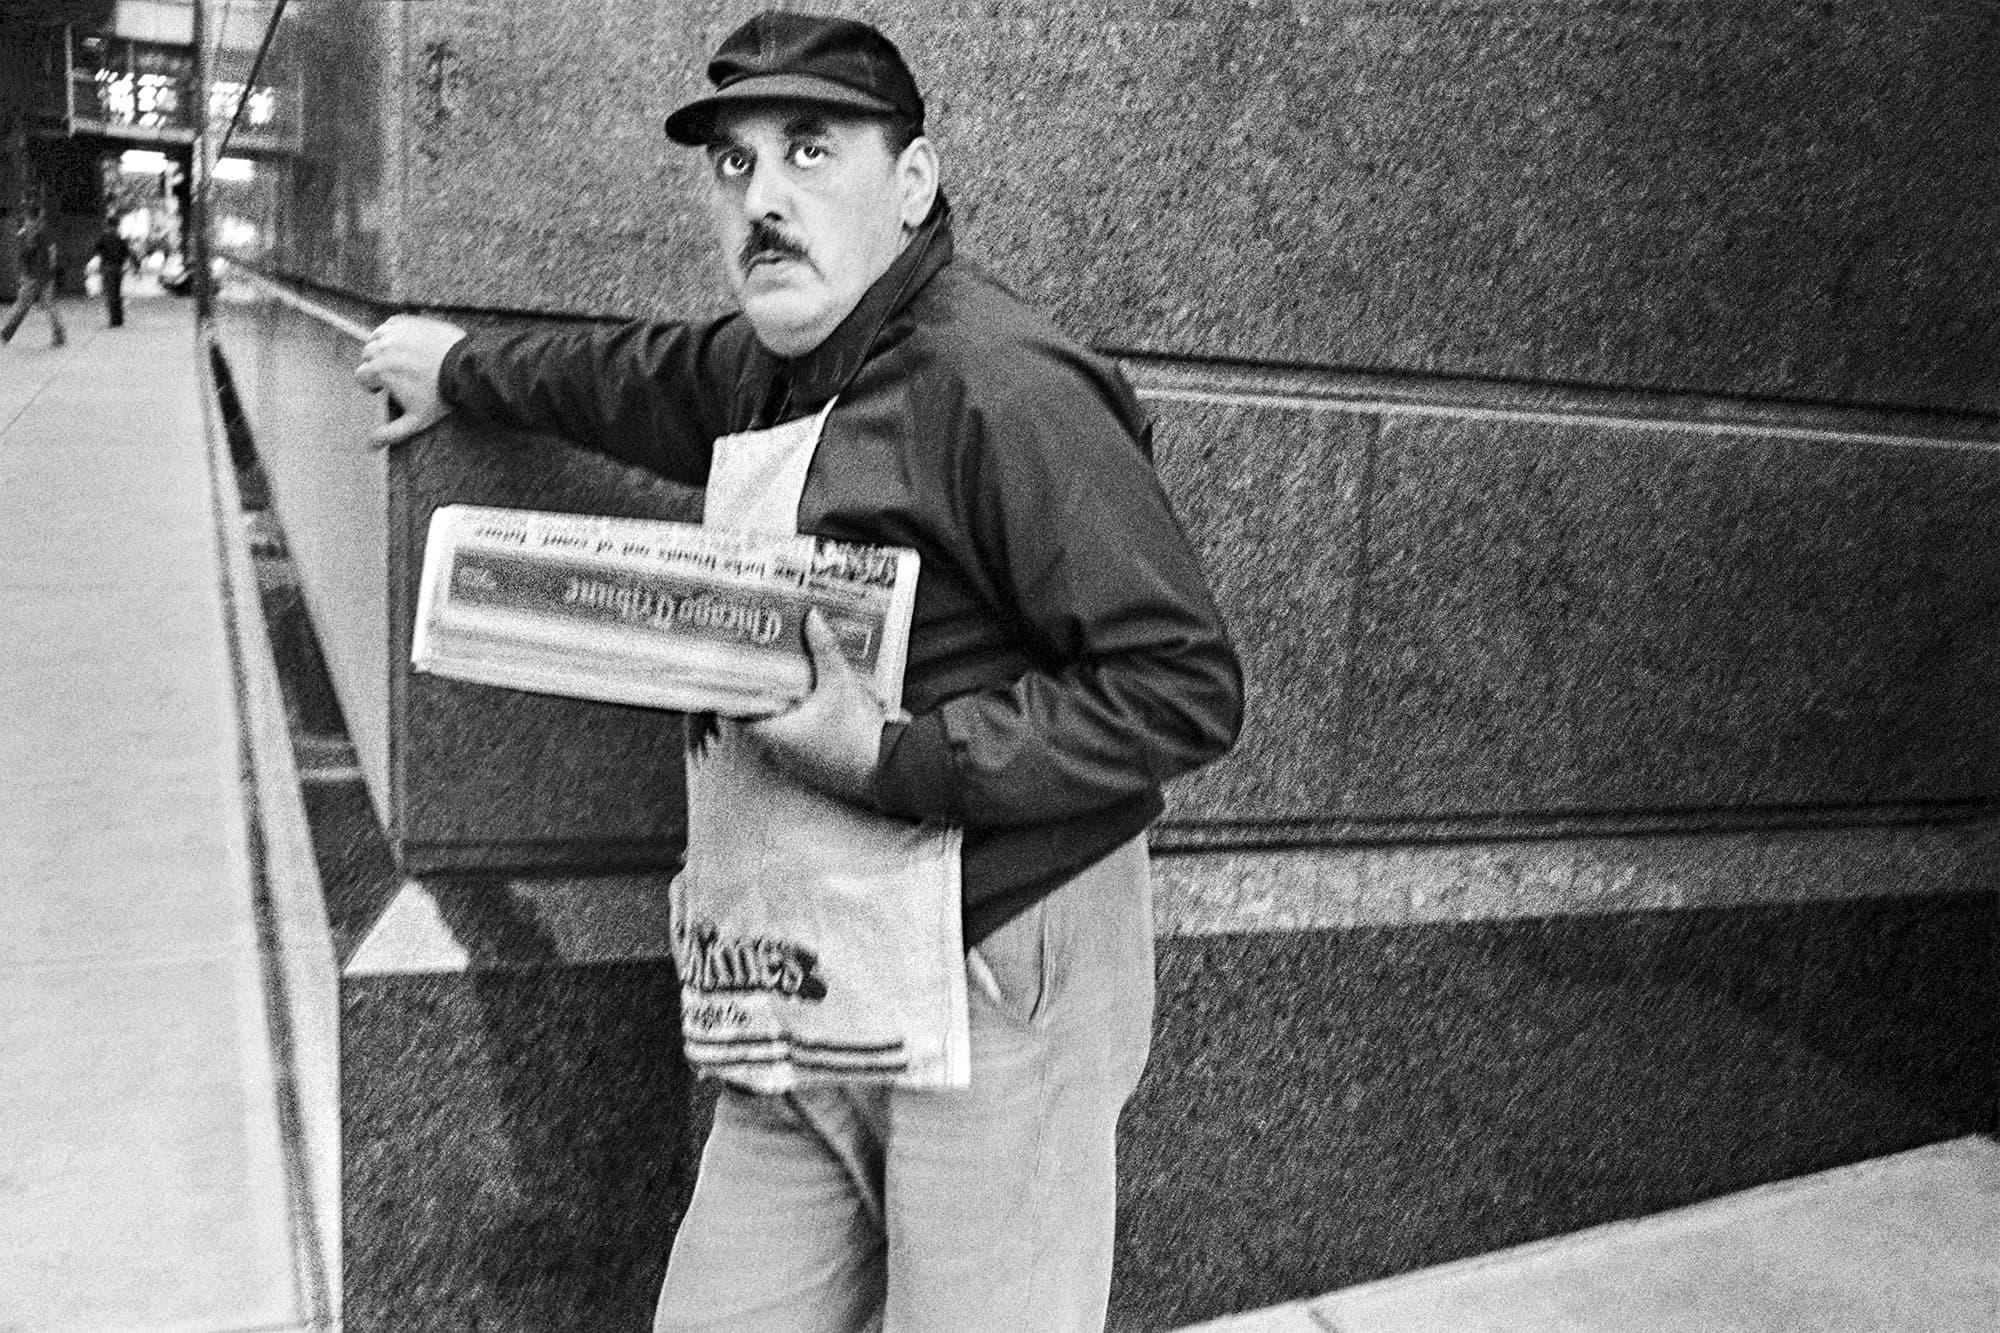 Paper-Man-1979 arthur lazar